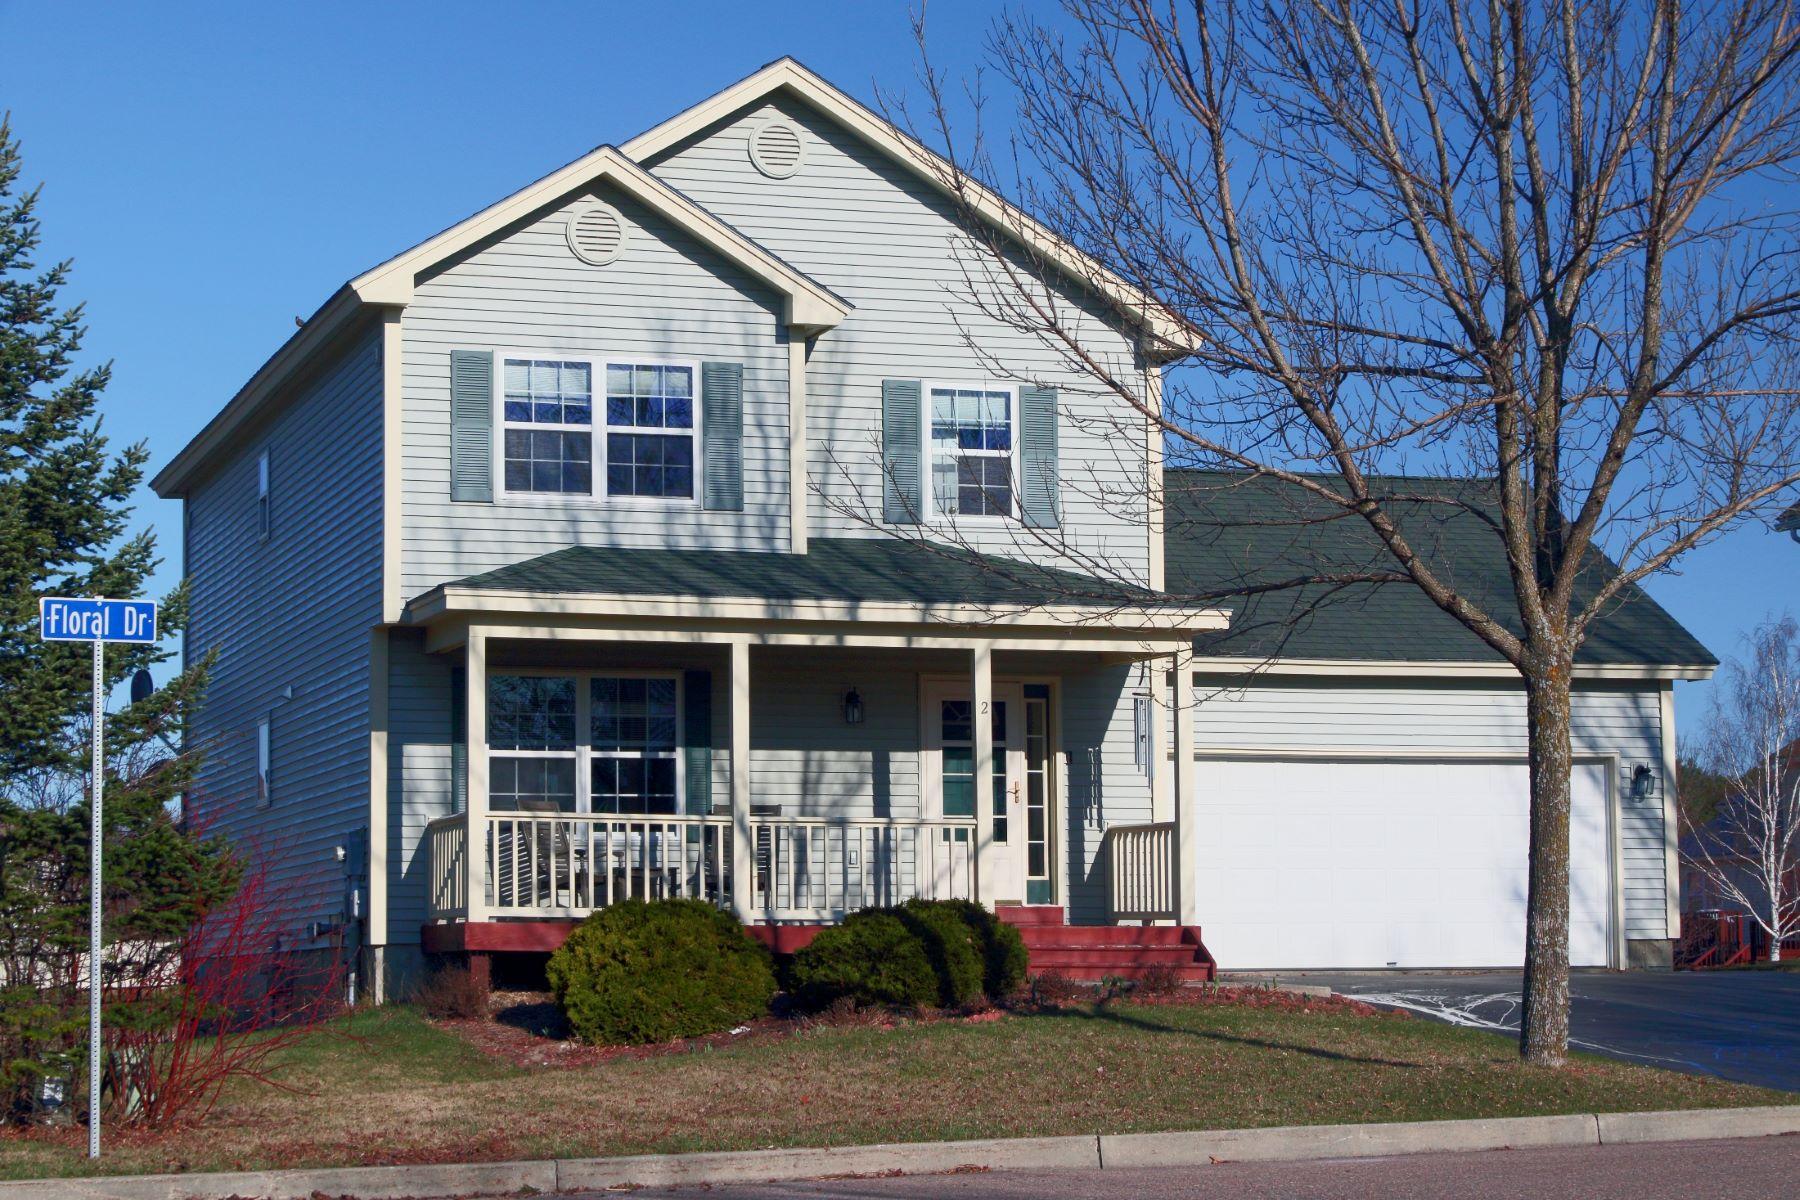 Villa per Vendita alle ore 2 Floral Street, South Burlington South Burlington, Vermont, 05403 Stati Uniti